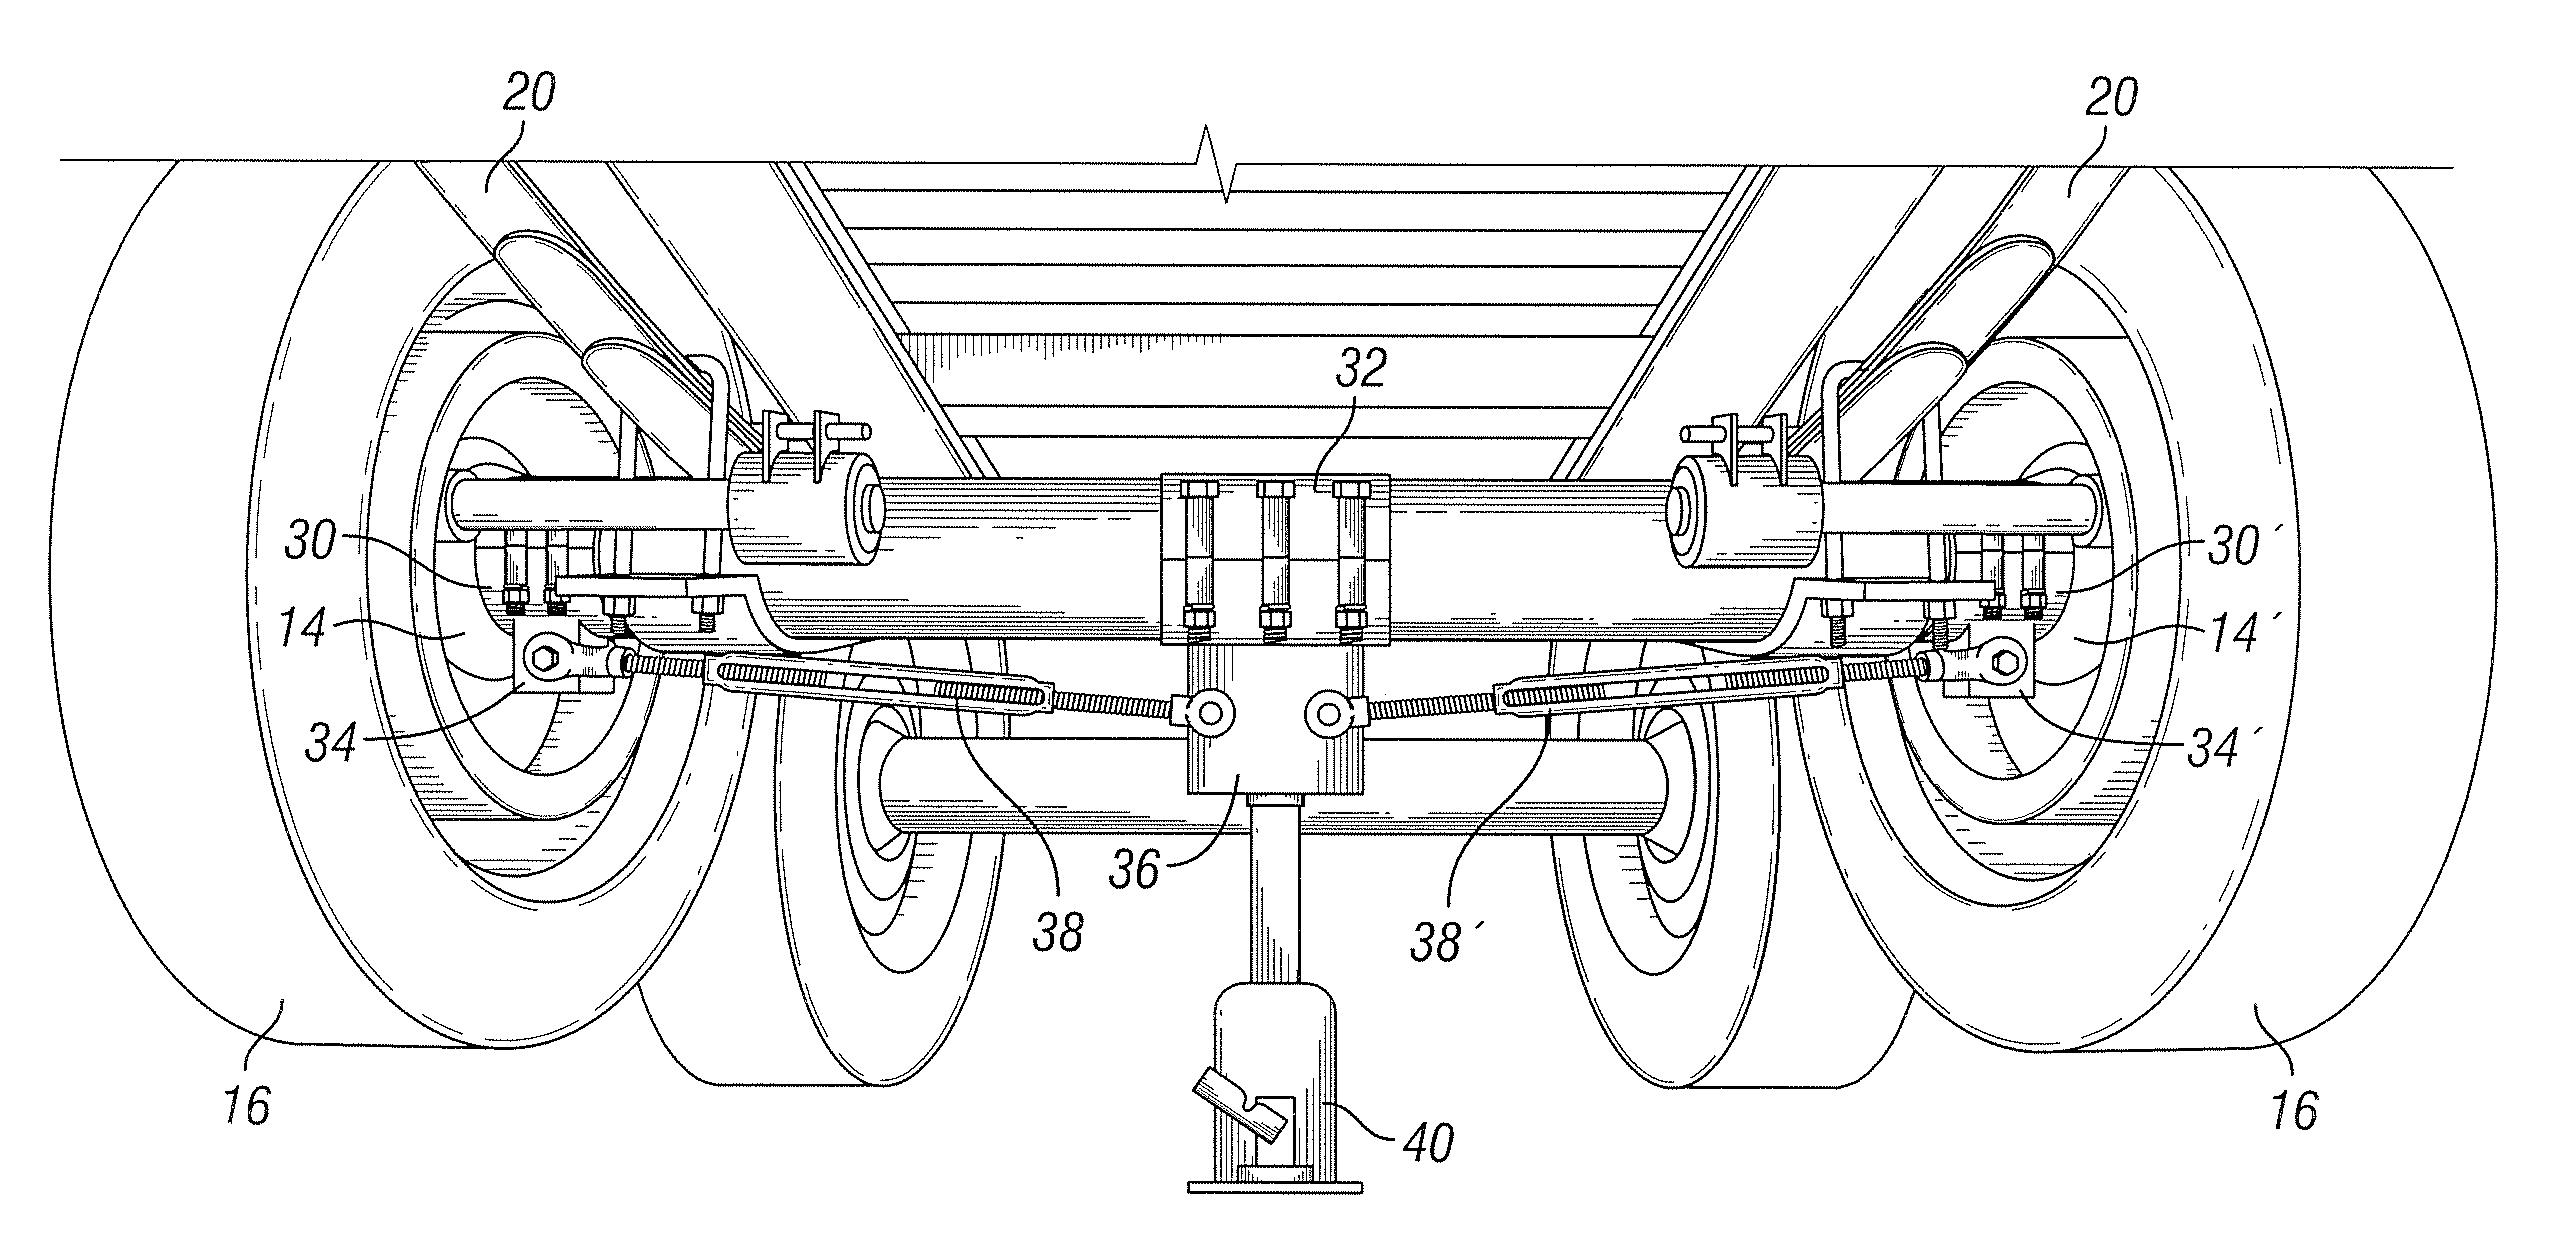 Wabco Ab Wiring Diagram Plug